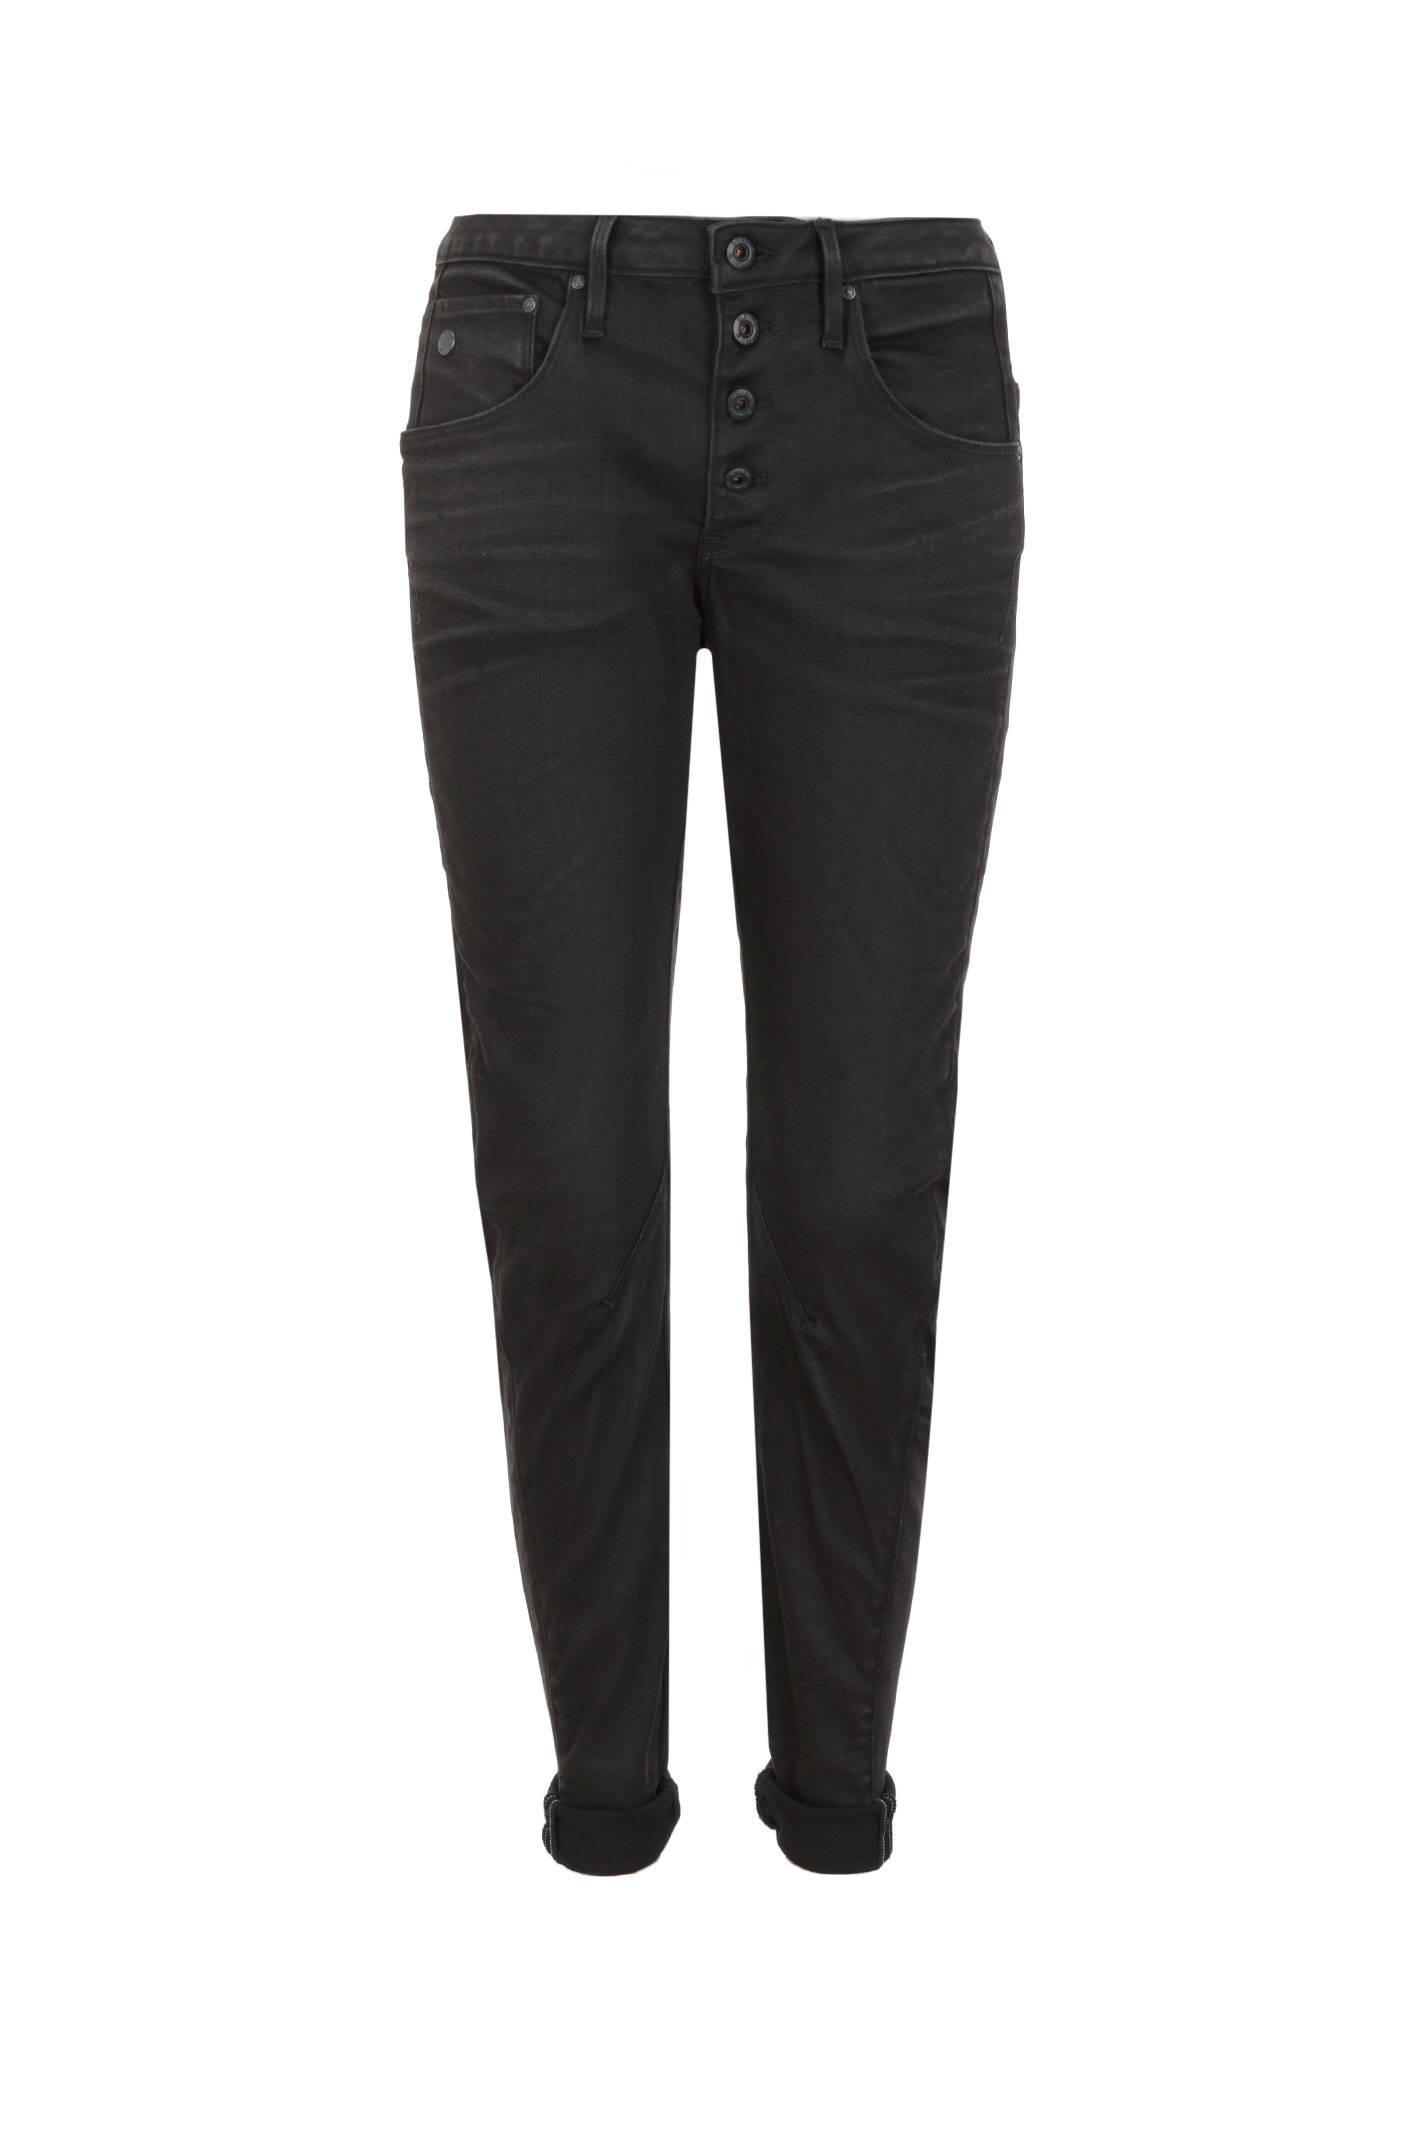 boyfriendy arc 3d g star raw czarny jeansy spodnie. Black Bedroom Furniture Sets. Home Design Ideas